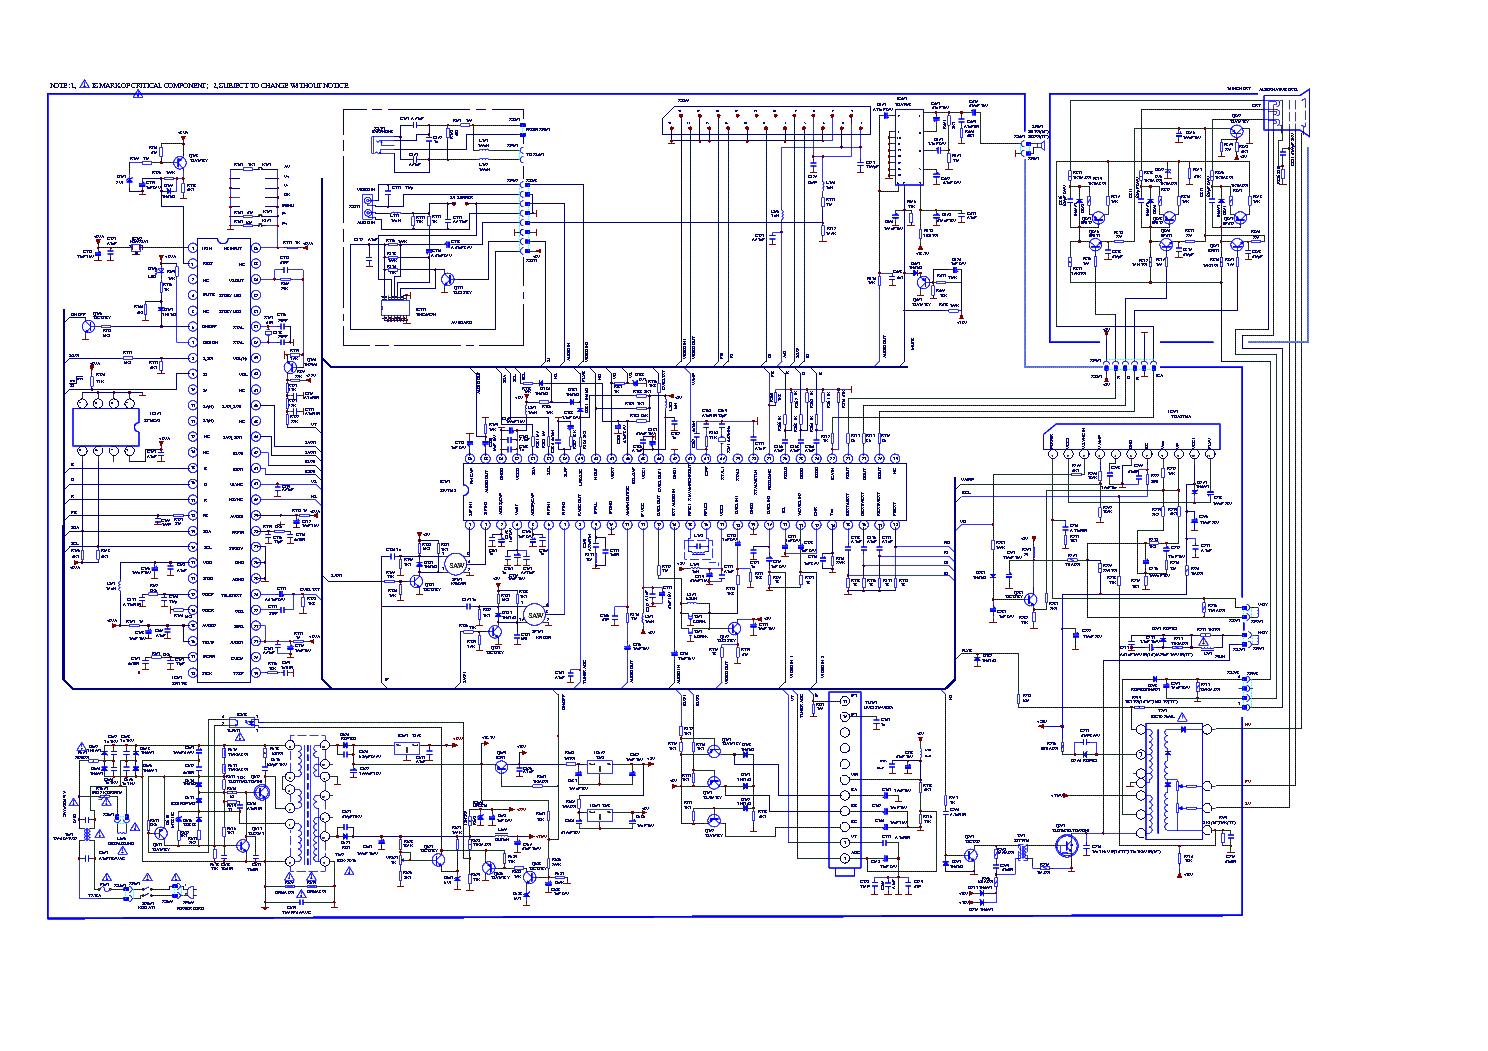 51 тц 418 схема